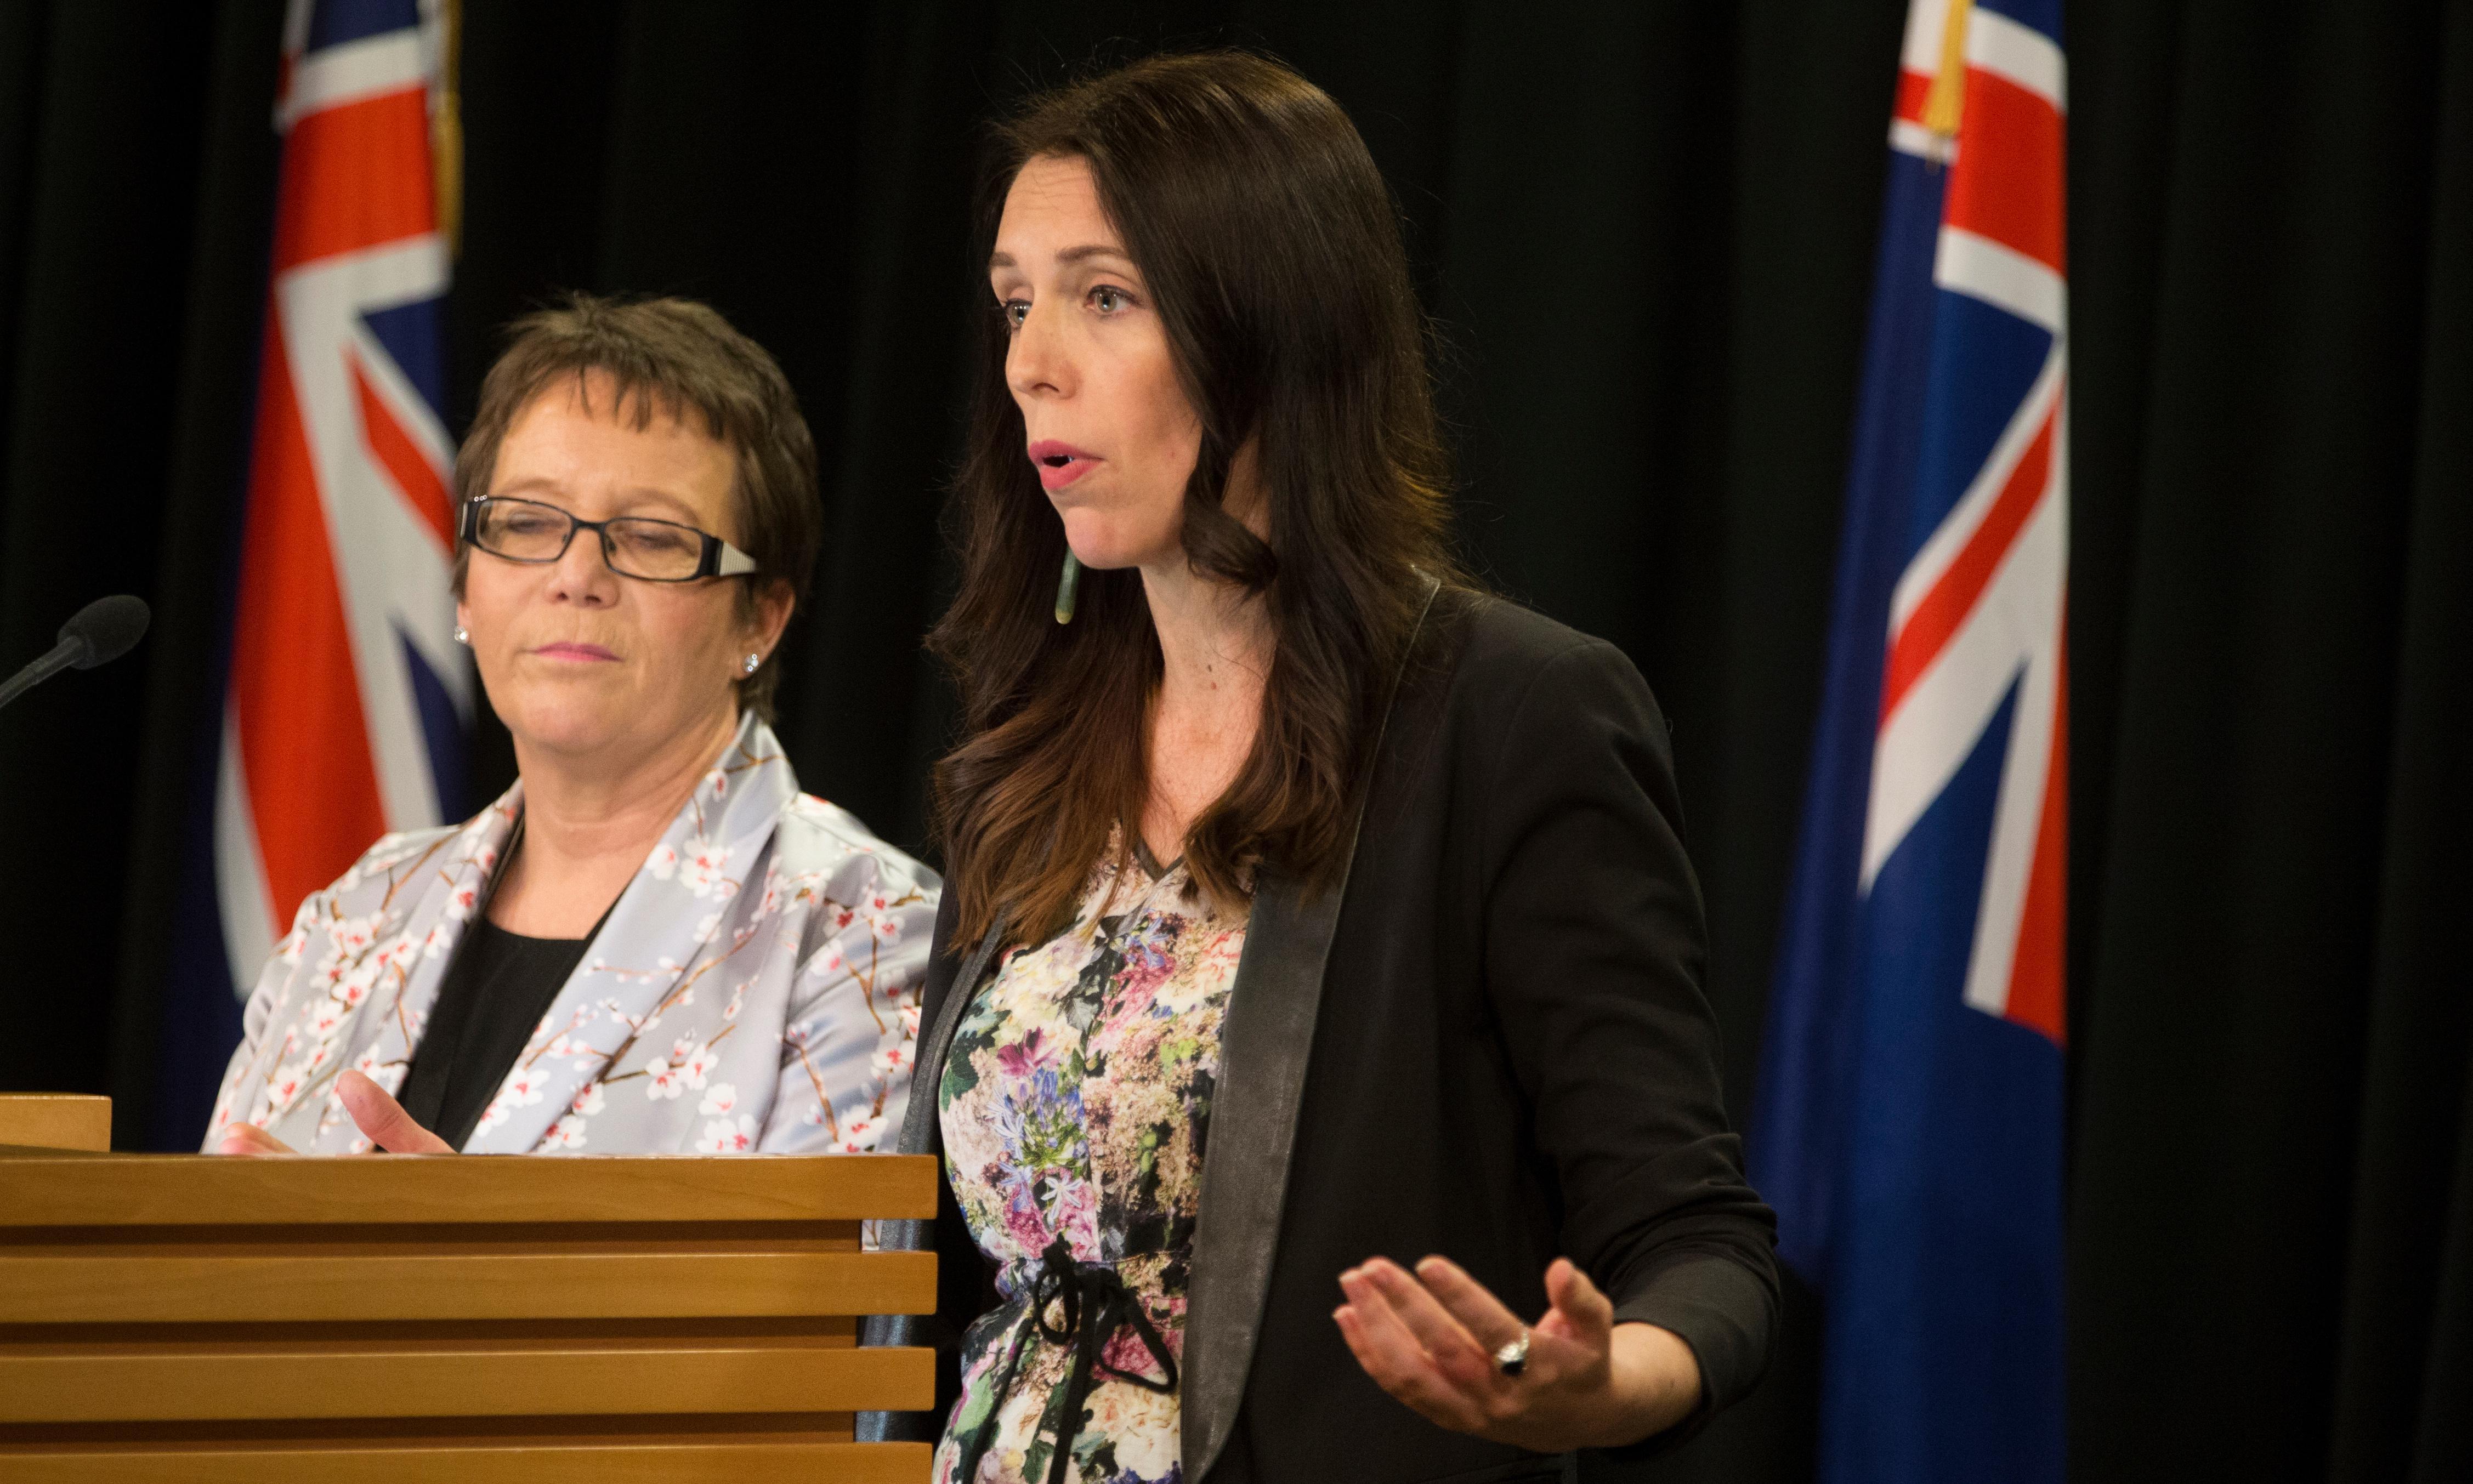 Jacinda Ardern disputes reports of diplomatic tensions with China